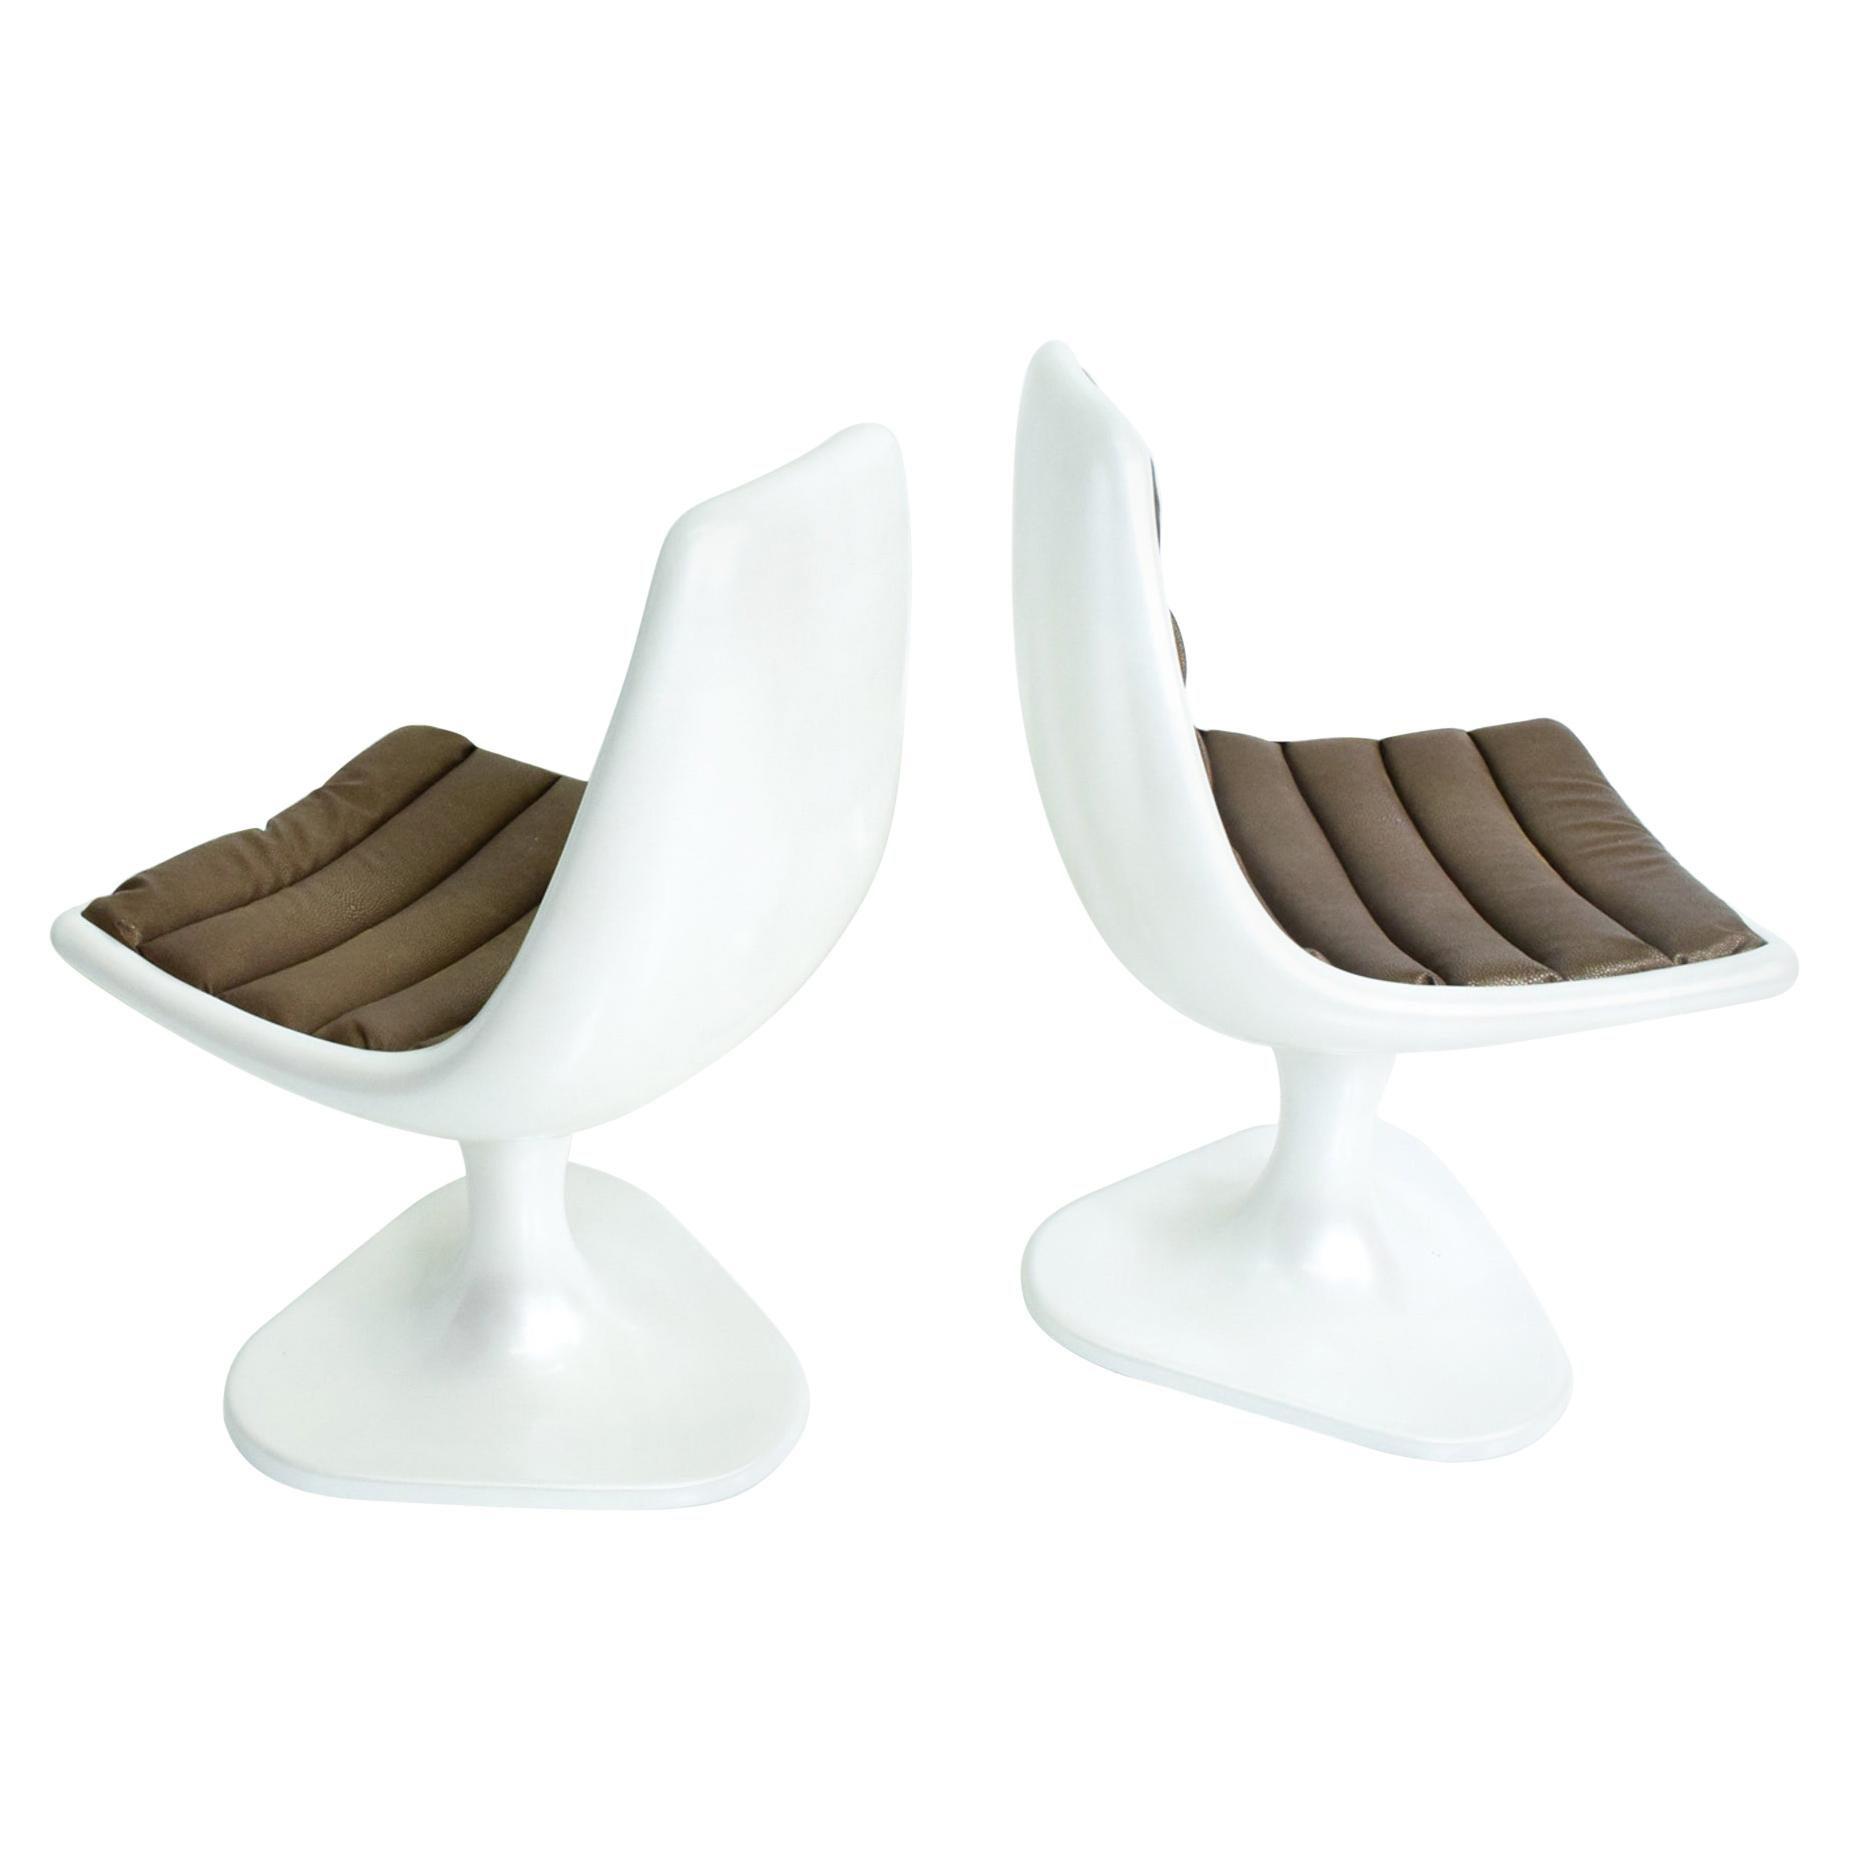 Dazzling White Atomic Fiberglass Side Chair Set Eero Saarinen Style 1970s Mexico